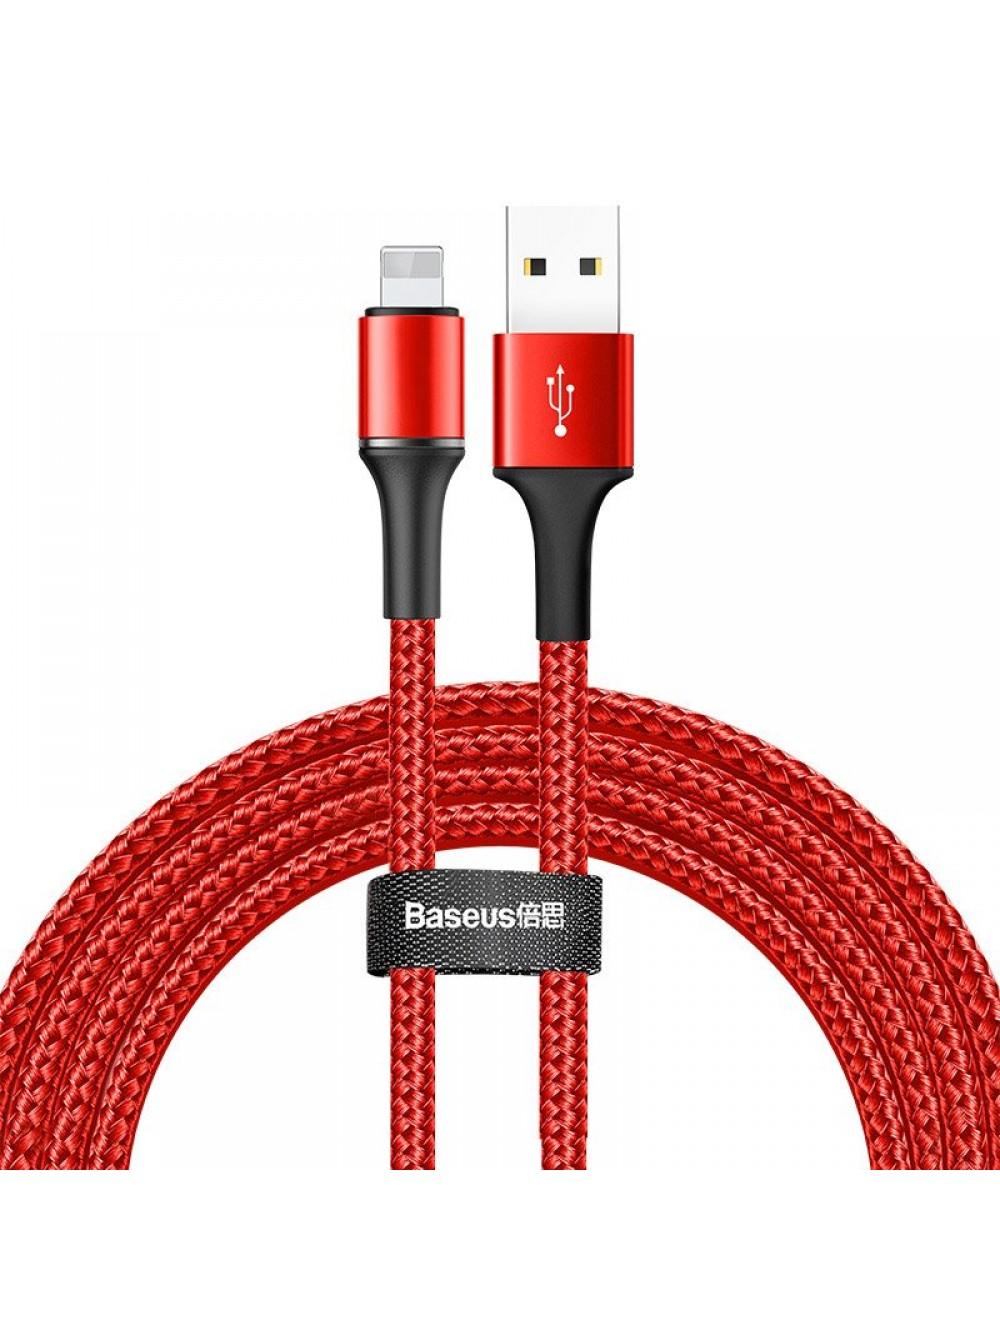 baseus calgh c09 rgb lightning cable